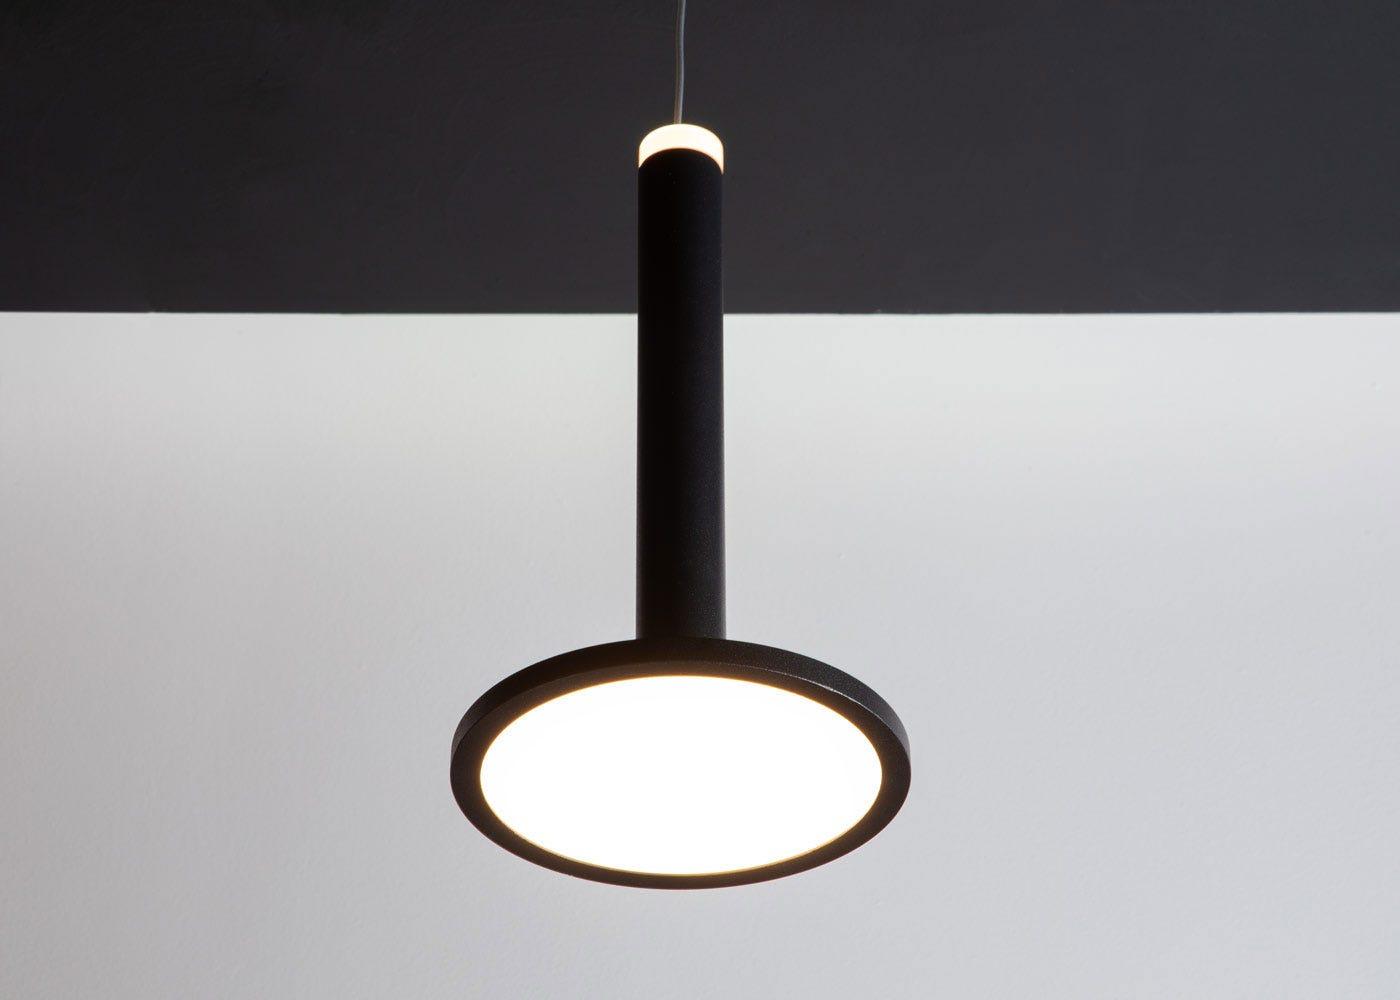 LED light source.